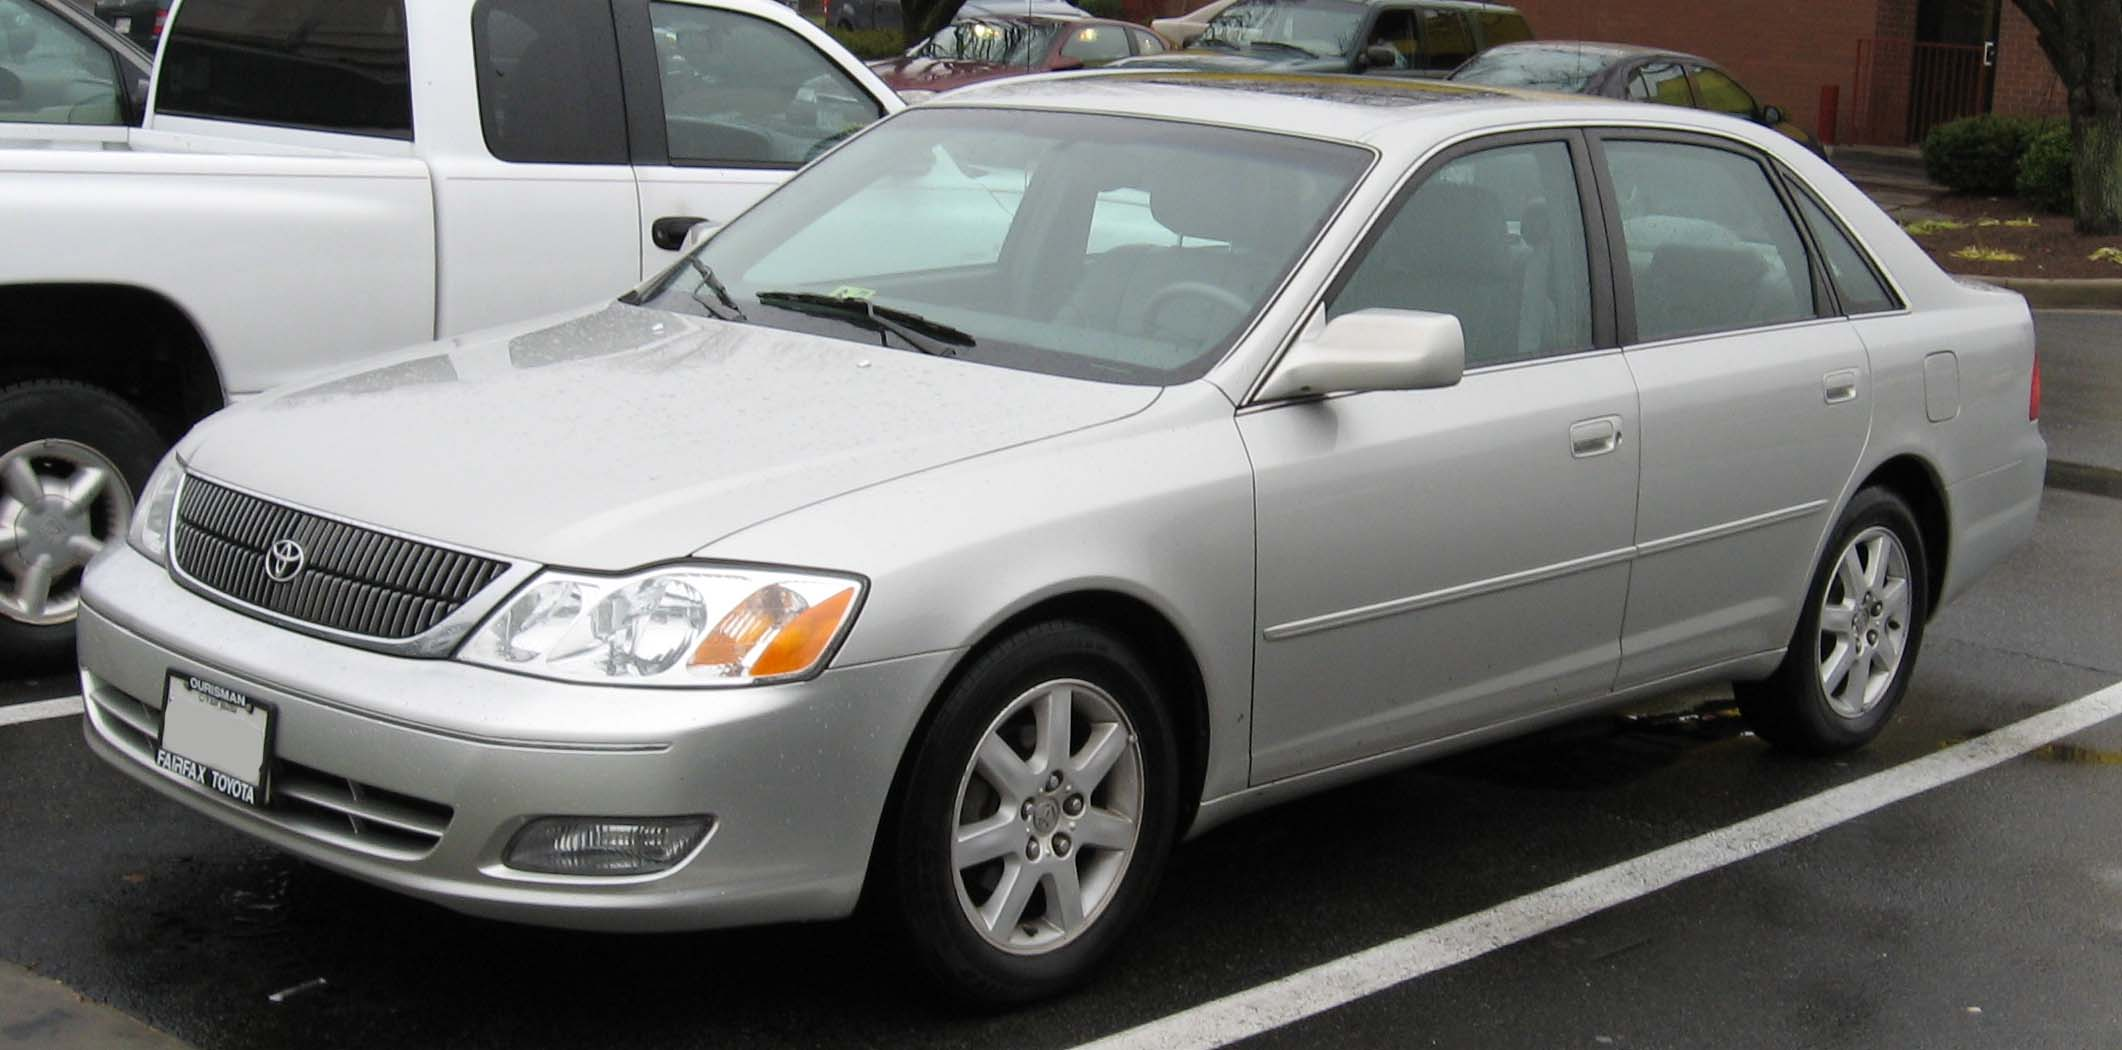 File:00-02 Toyota Avalon.jpg - Wikimedia Commons